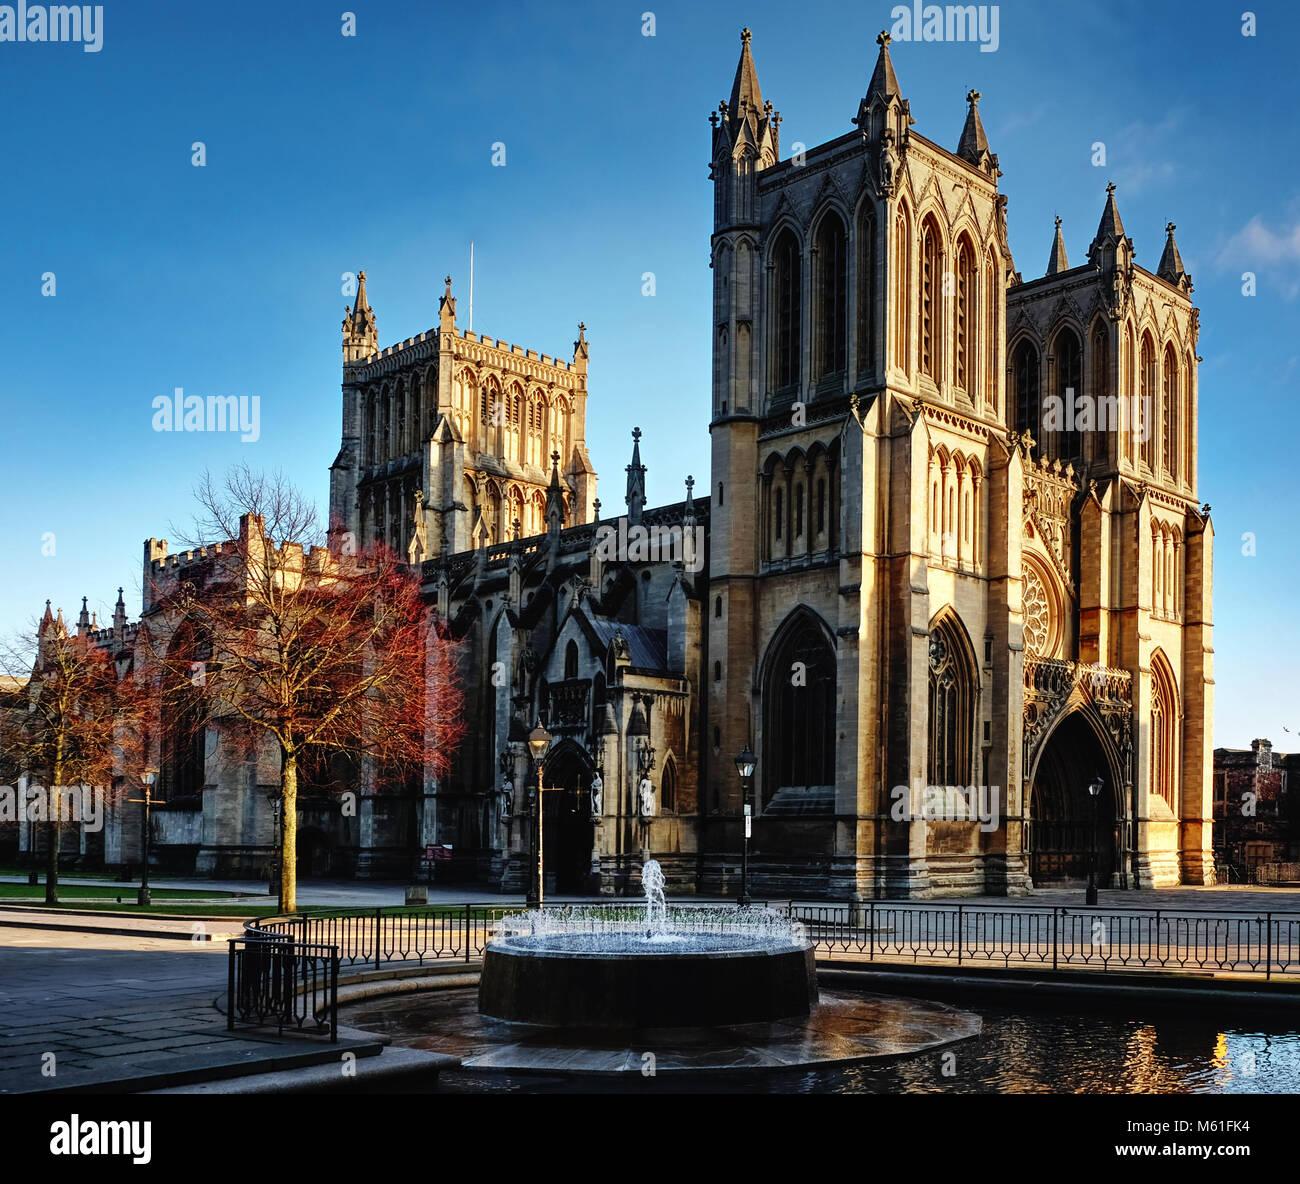 Bristol Cathedral, Bristol, UK - Stock Image